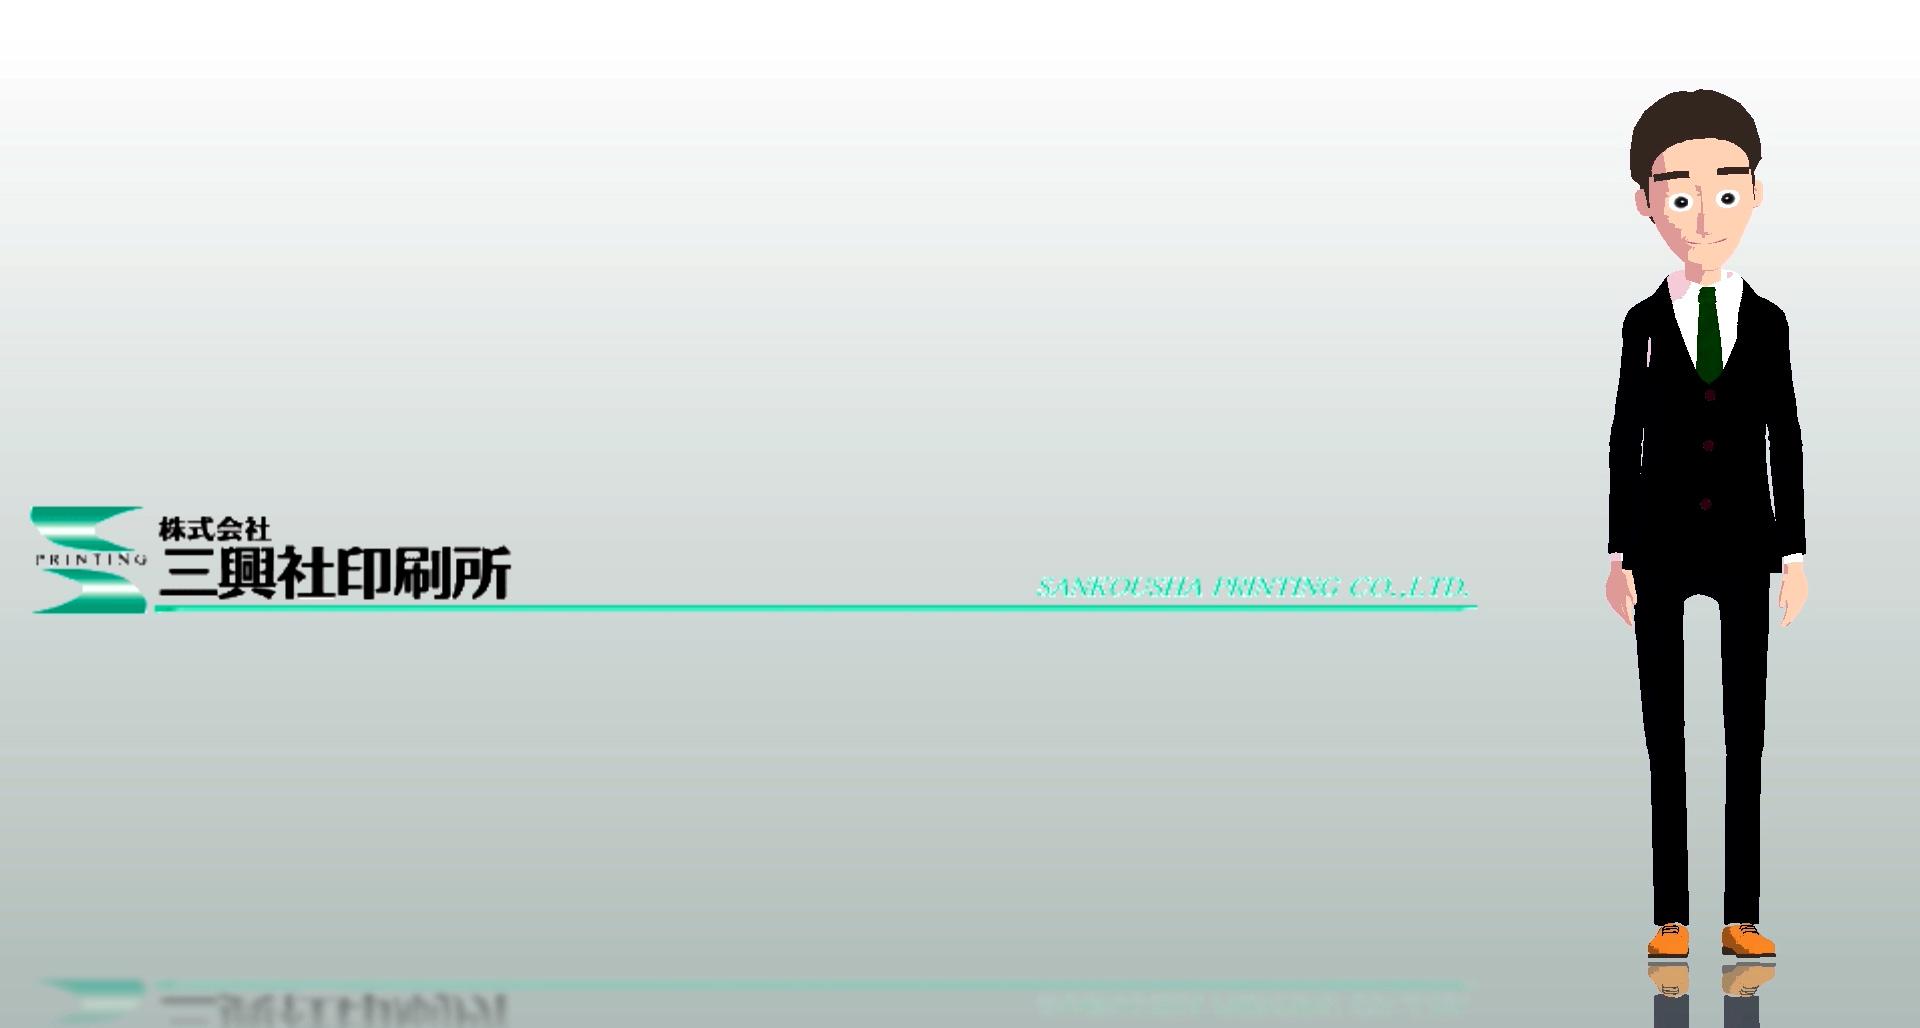 昭和21年創業|株式会社三興社印刷所の歩み|熊谷市